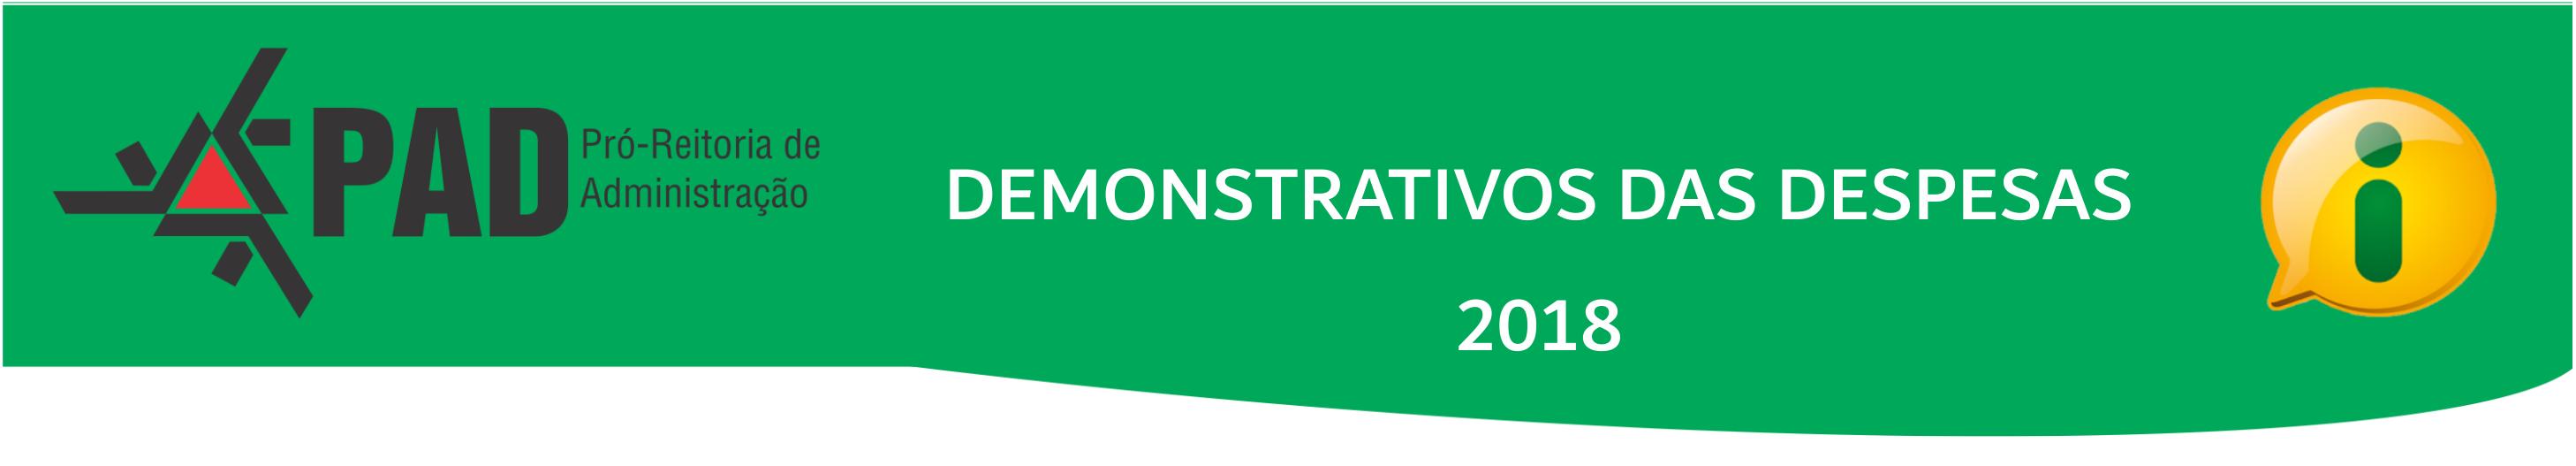 Demonstrativos Desp. 2018.png